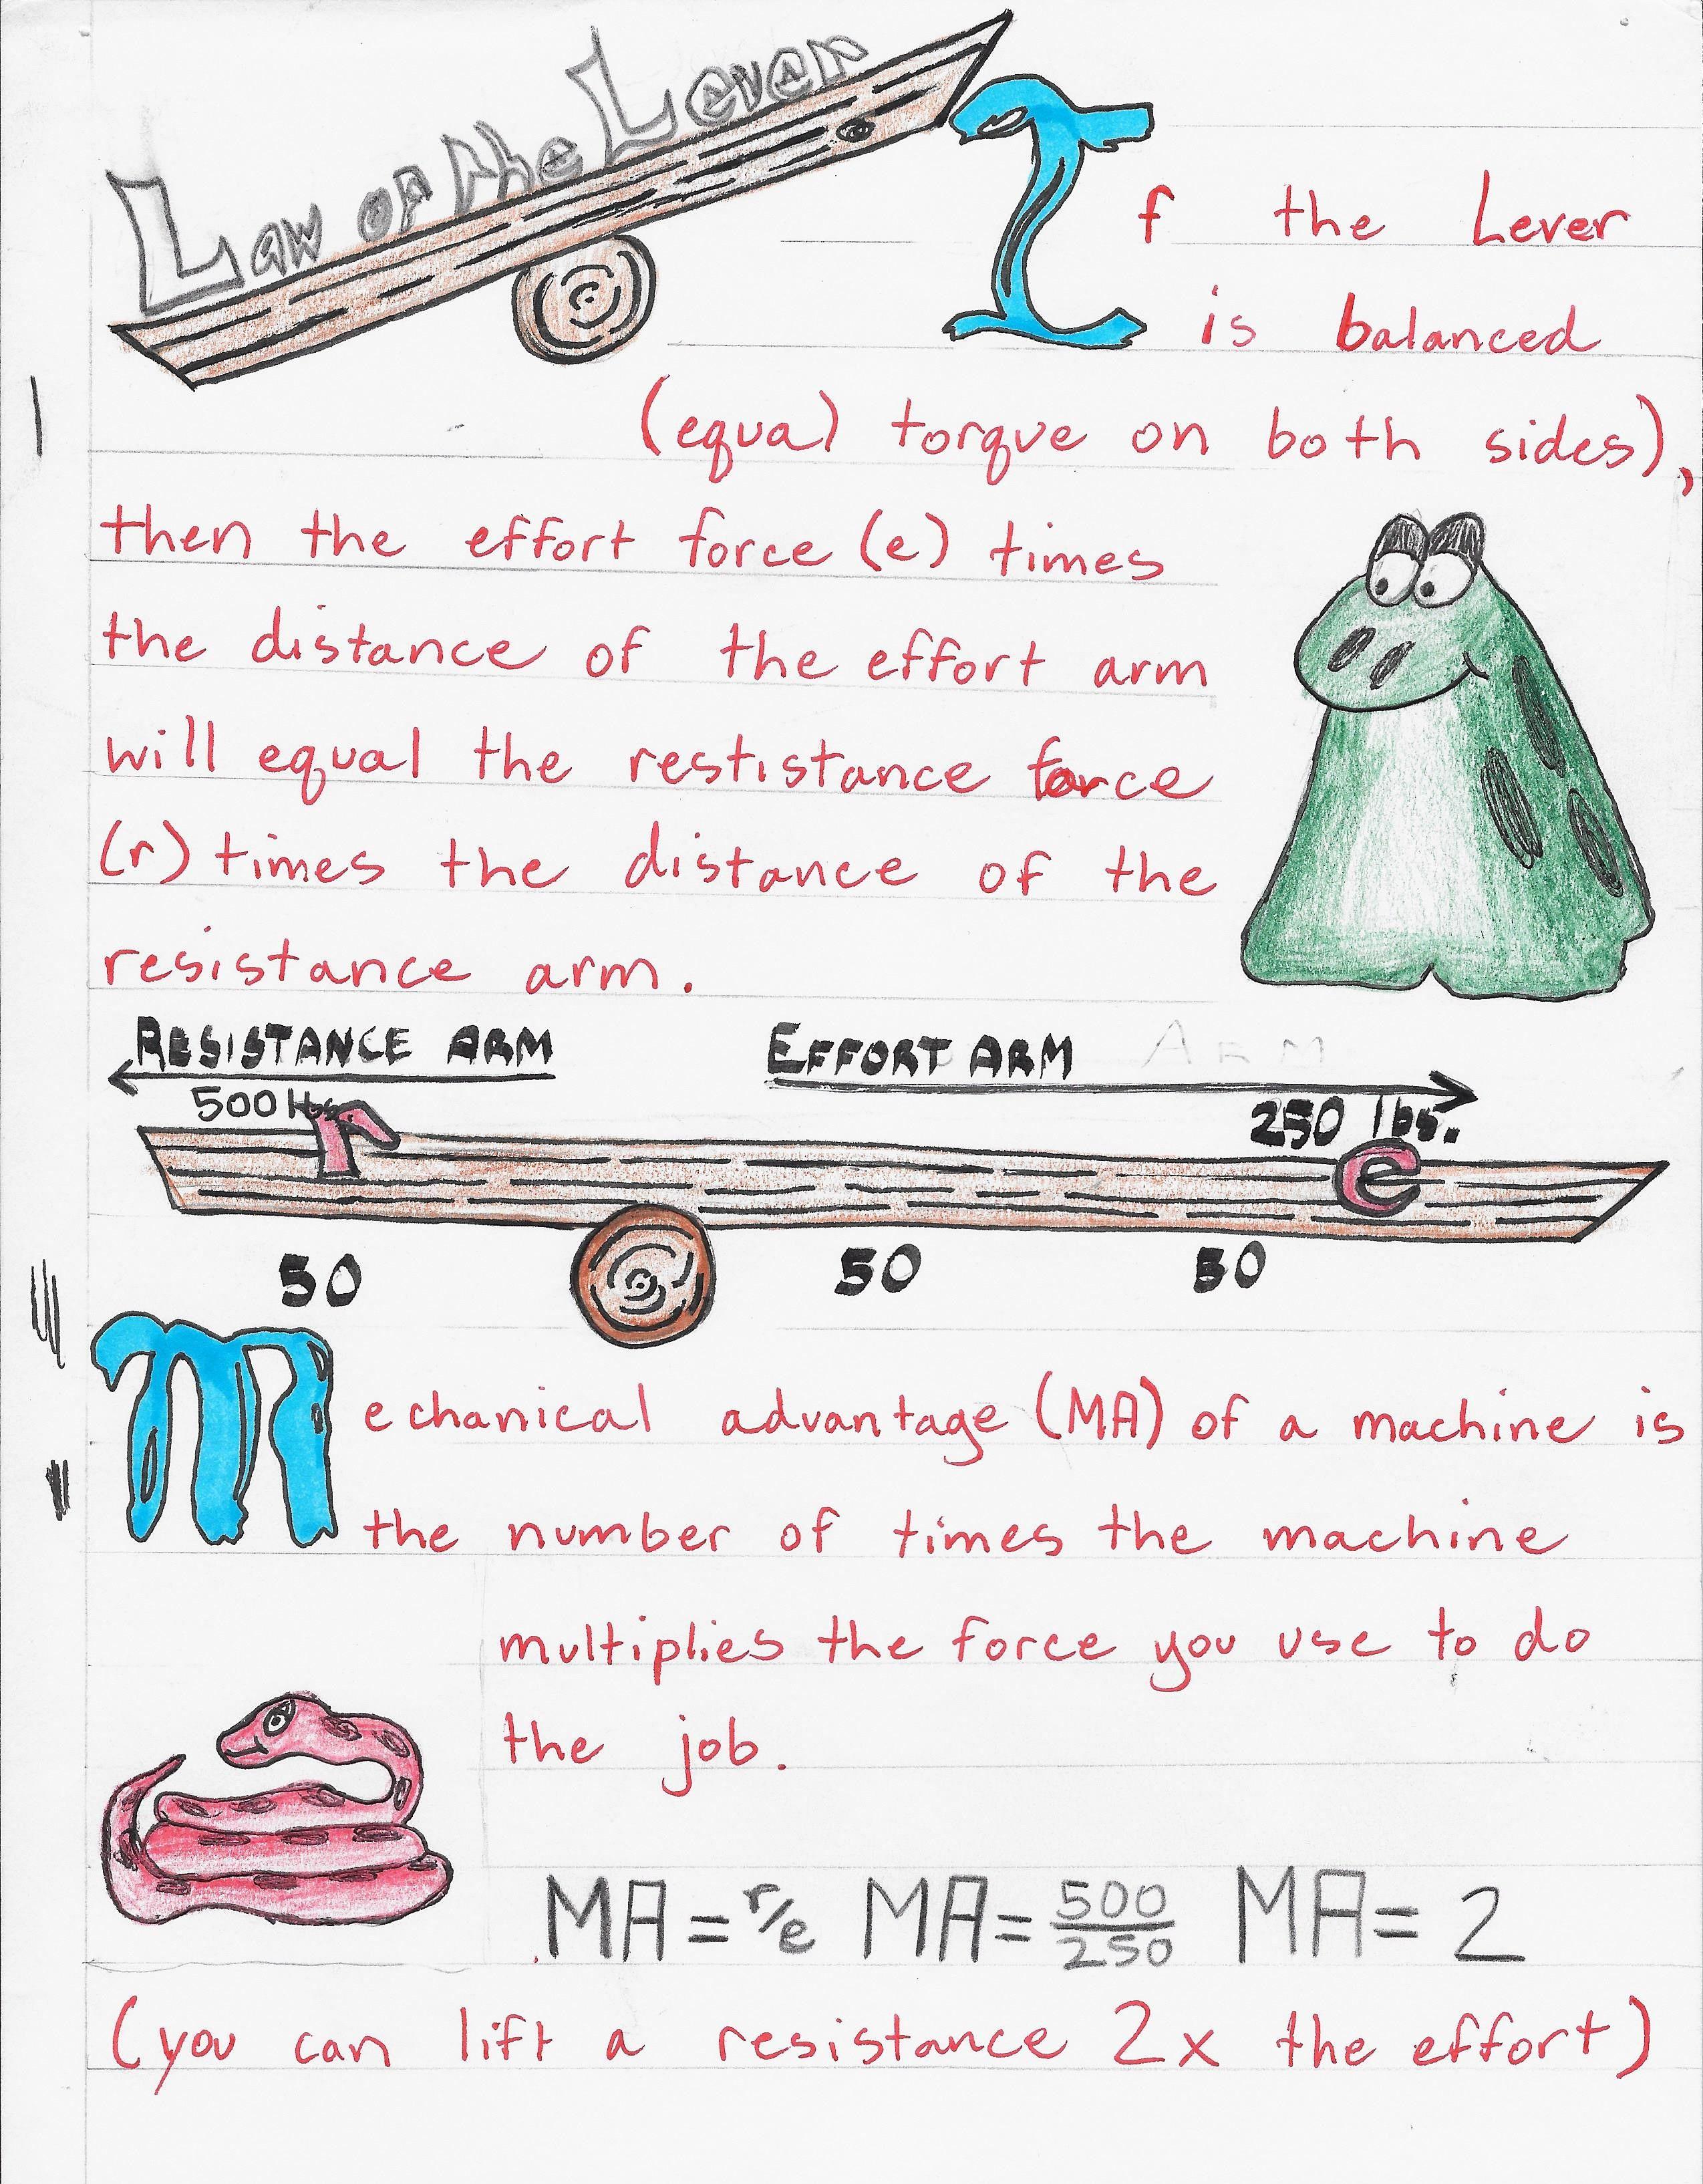 7th Physics Mechanics Law Of The Lever Mechanical